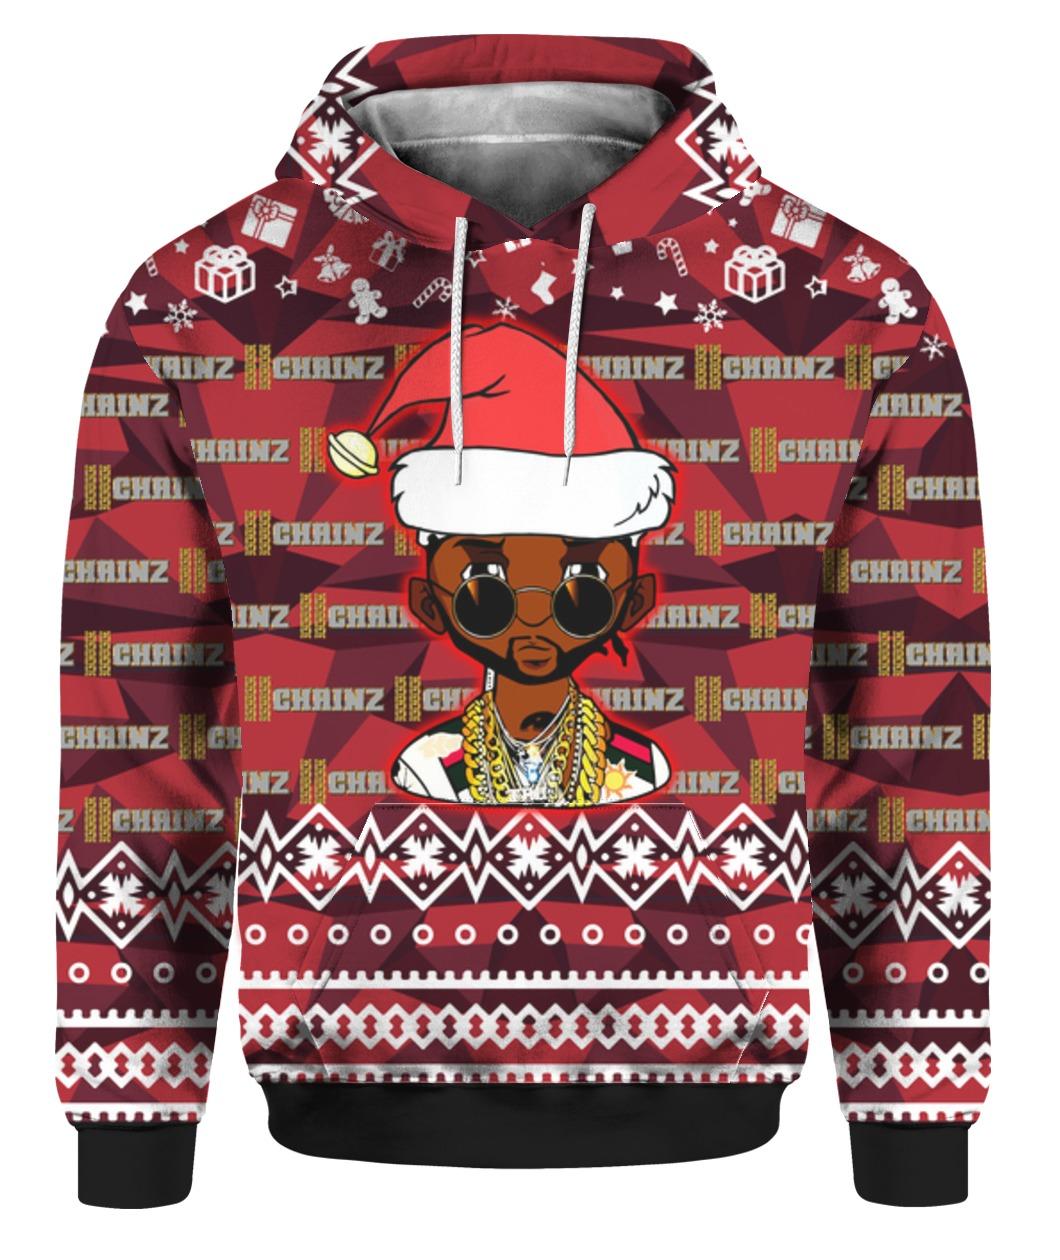 Christmas 2 chainz aka tity boi santa all over print shirt - maria